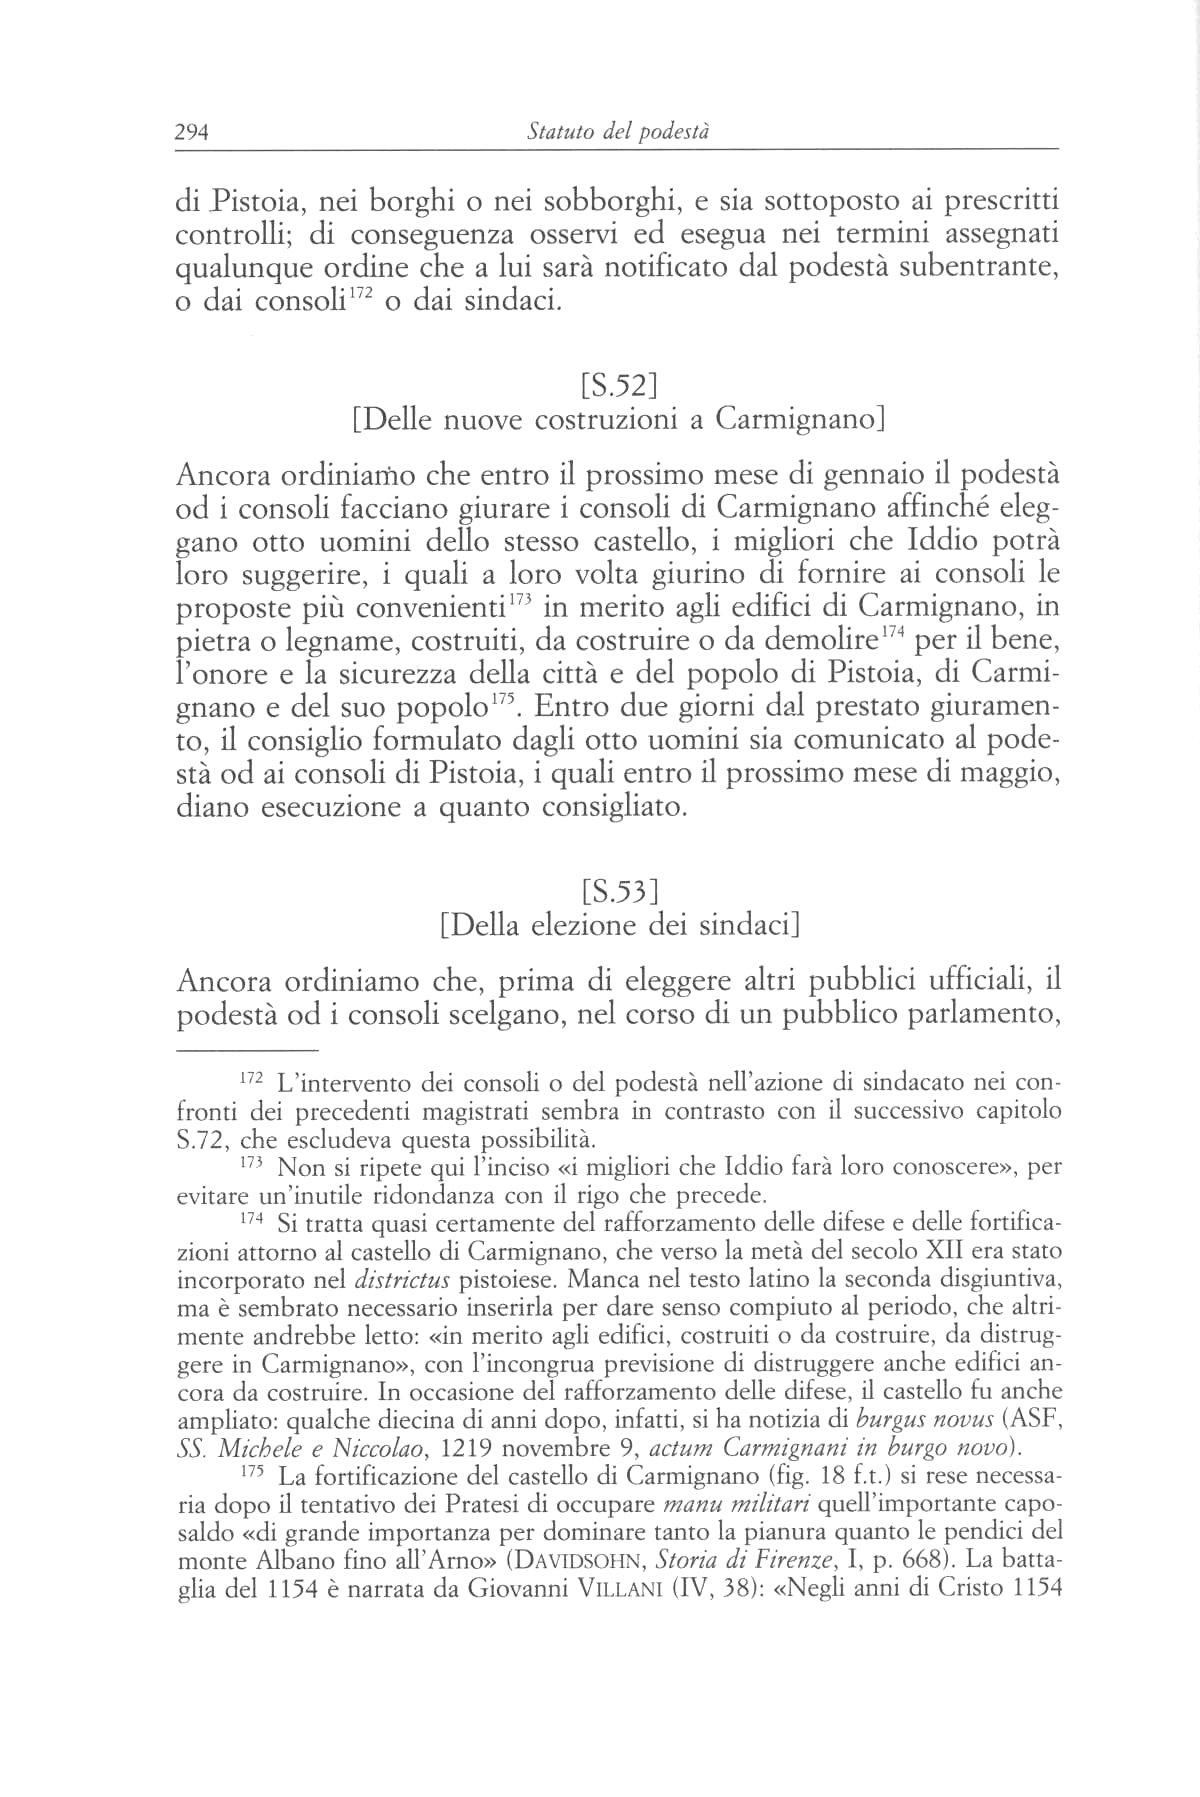 statuti pistoiesi del sec.XII 0294.jpg